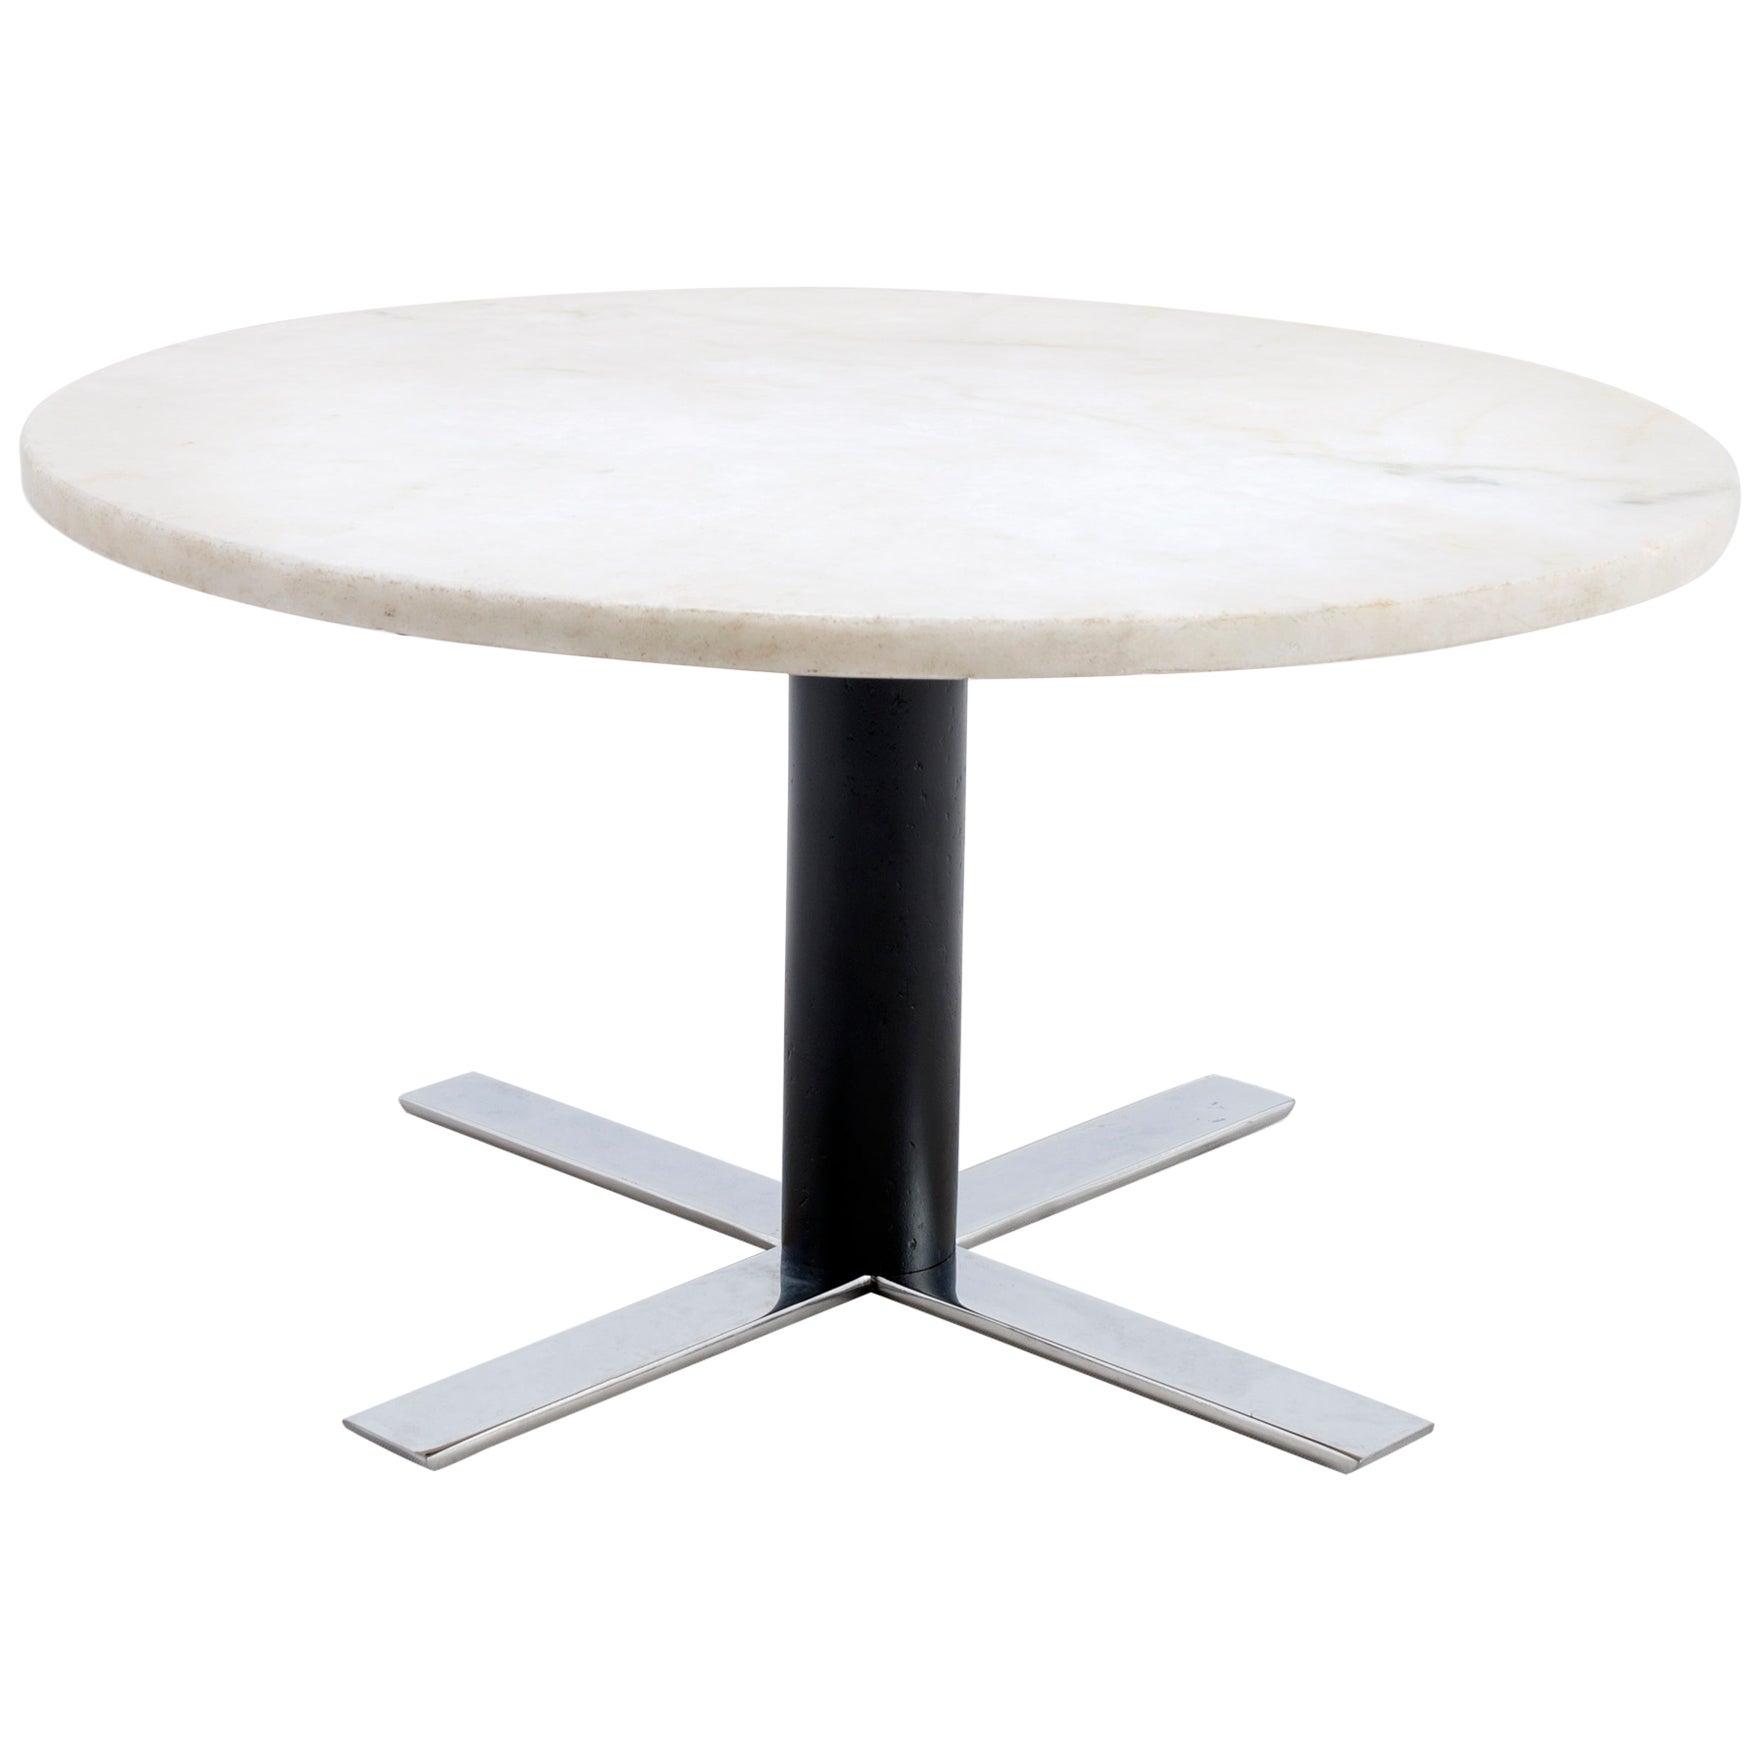 Jorge Zalszupin, Marble Coffee Table - Brazil, 1950s